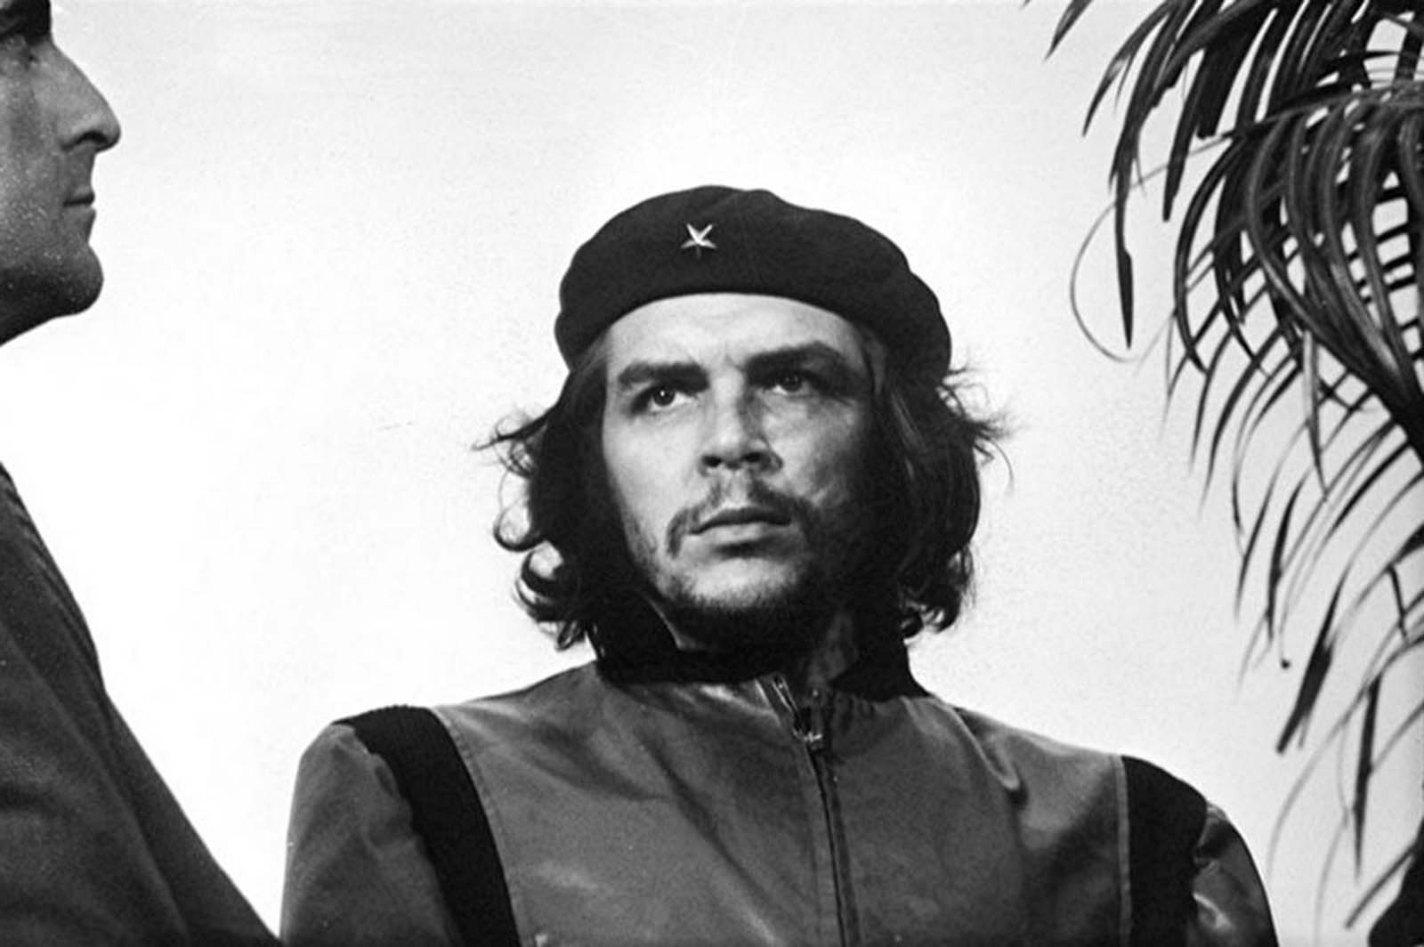 Guerillero heroico, Alberto Korda, 1960